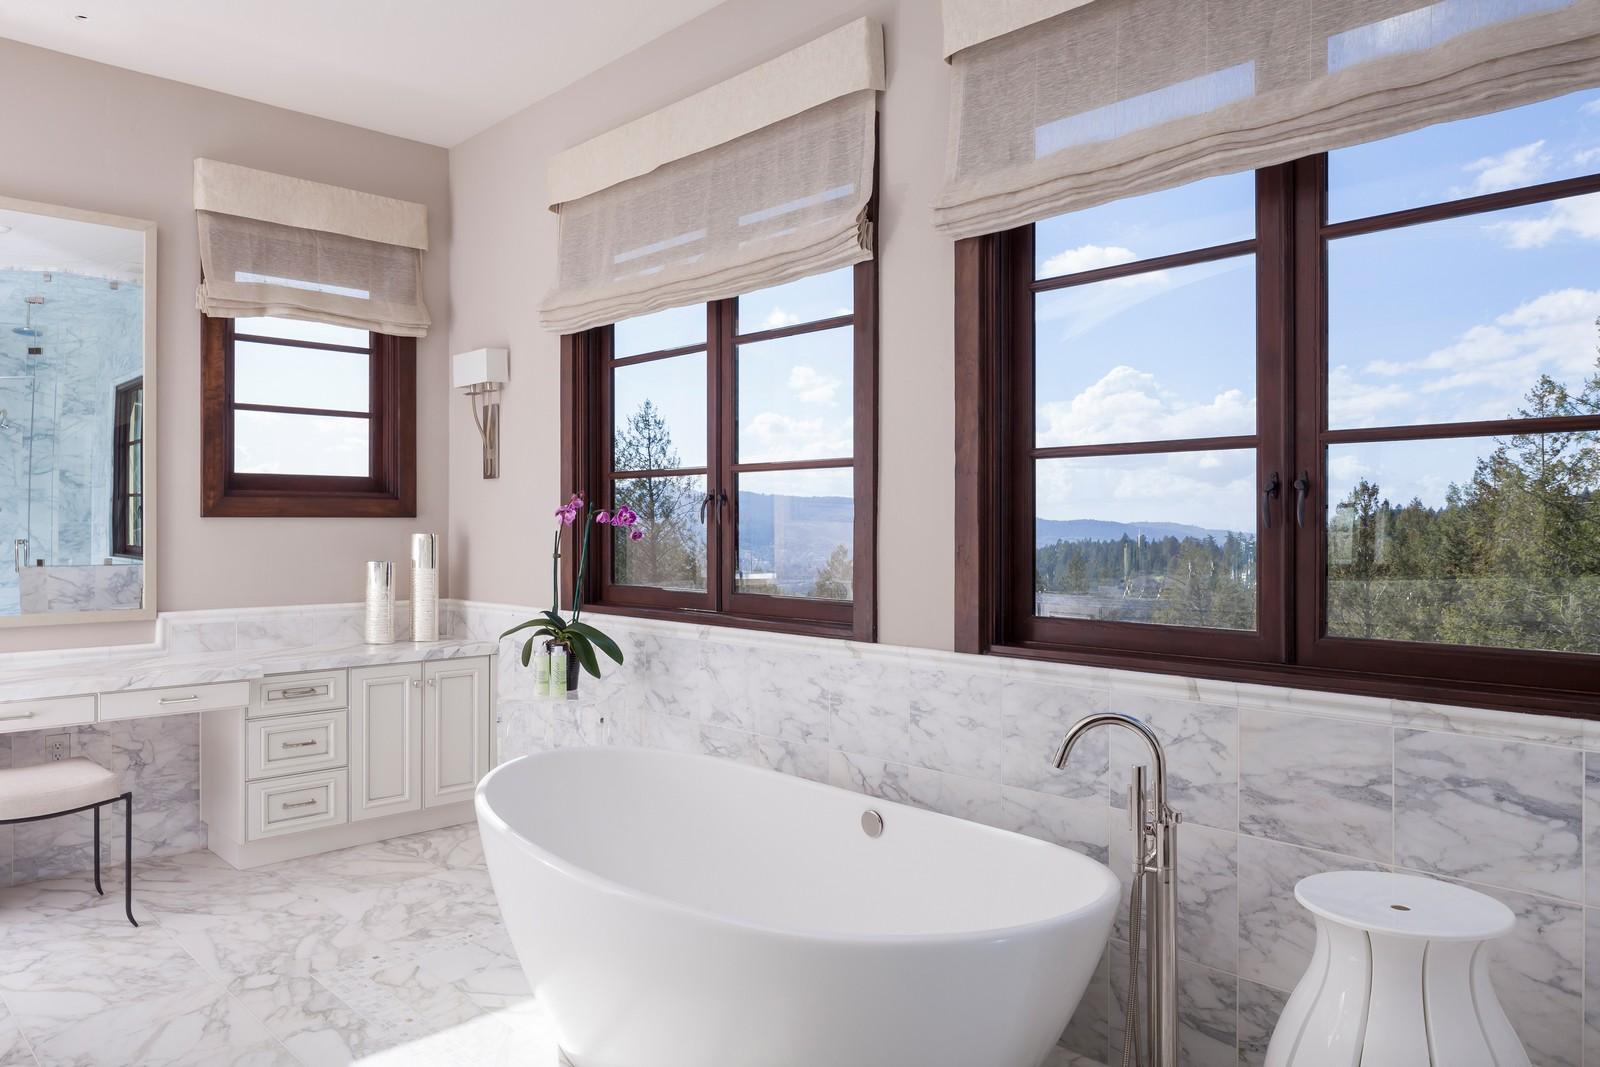 Additional photo for property listing at 748 Adobe Canyon Road  Kenwood, Калифорния 95452 Соединенные Штаты